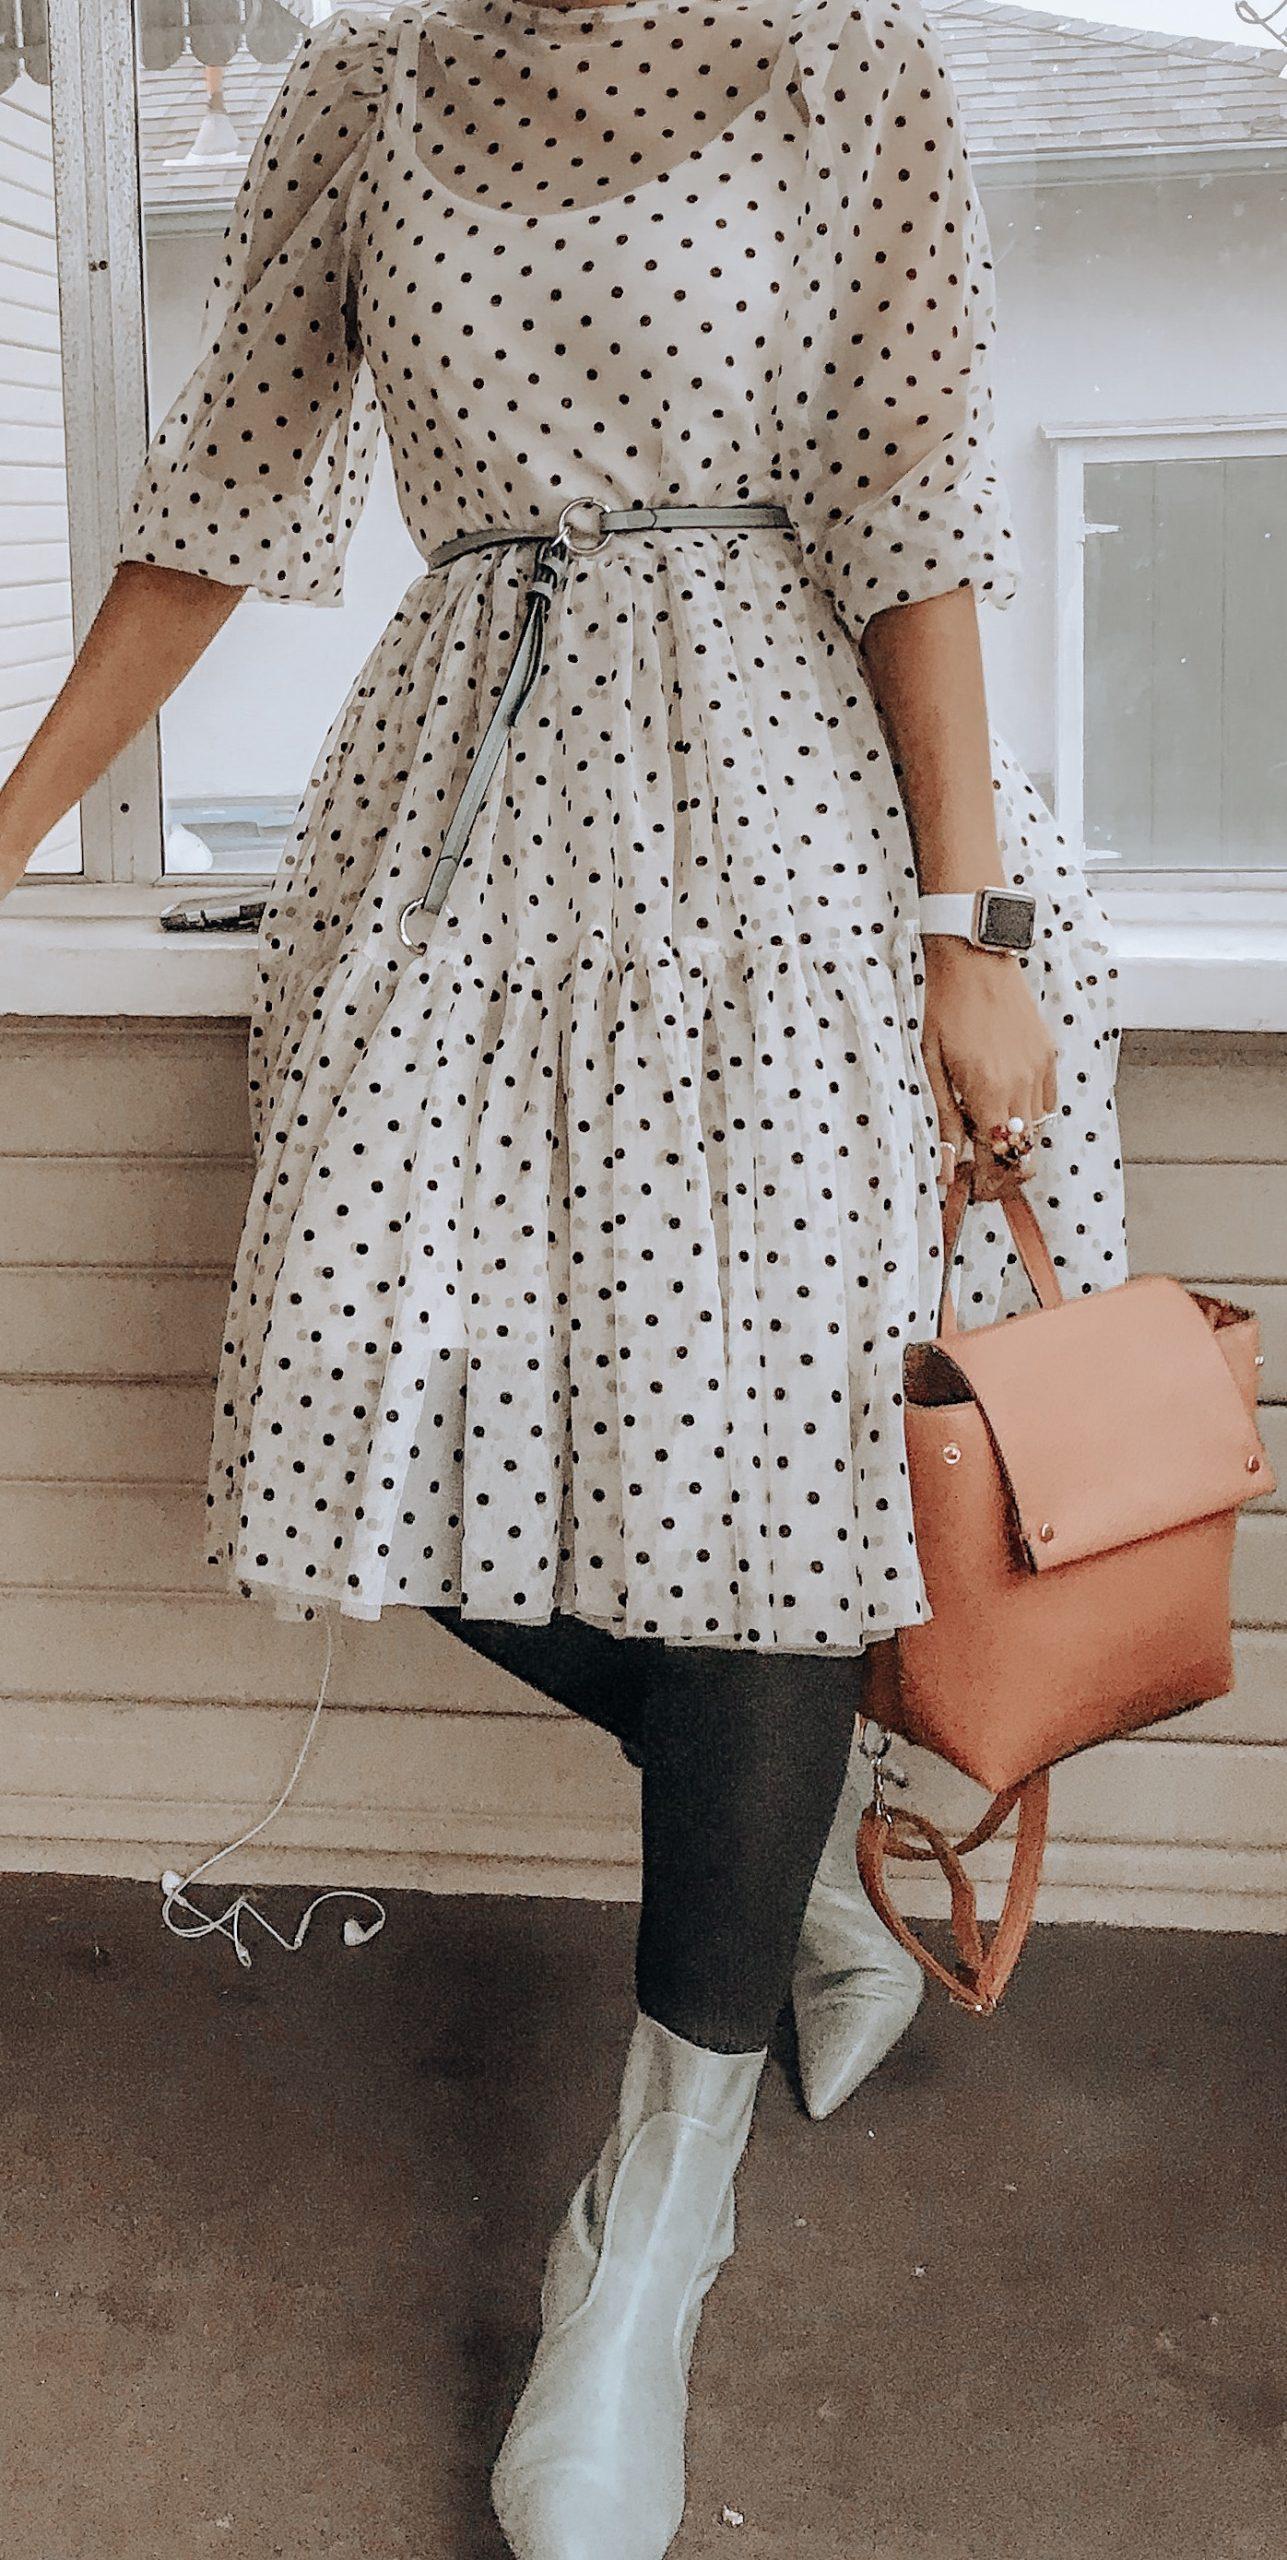 Holiday Look Book Day 13 – H&M Polka Dot Dress